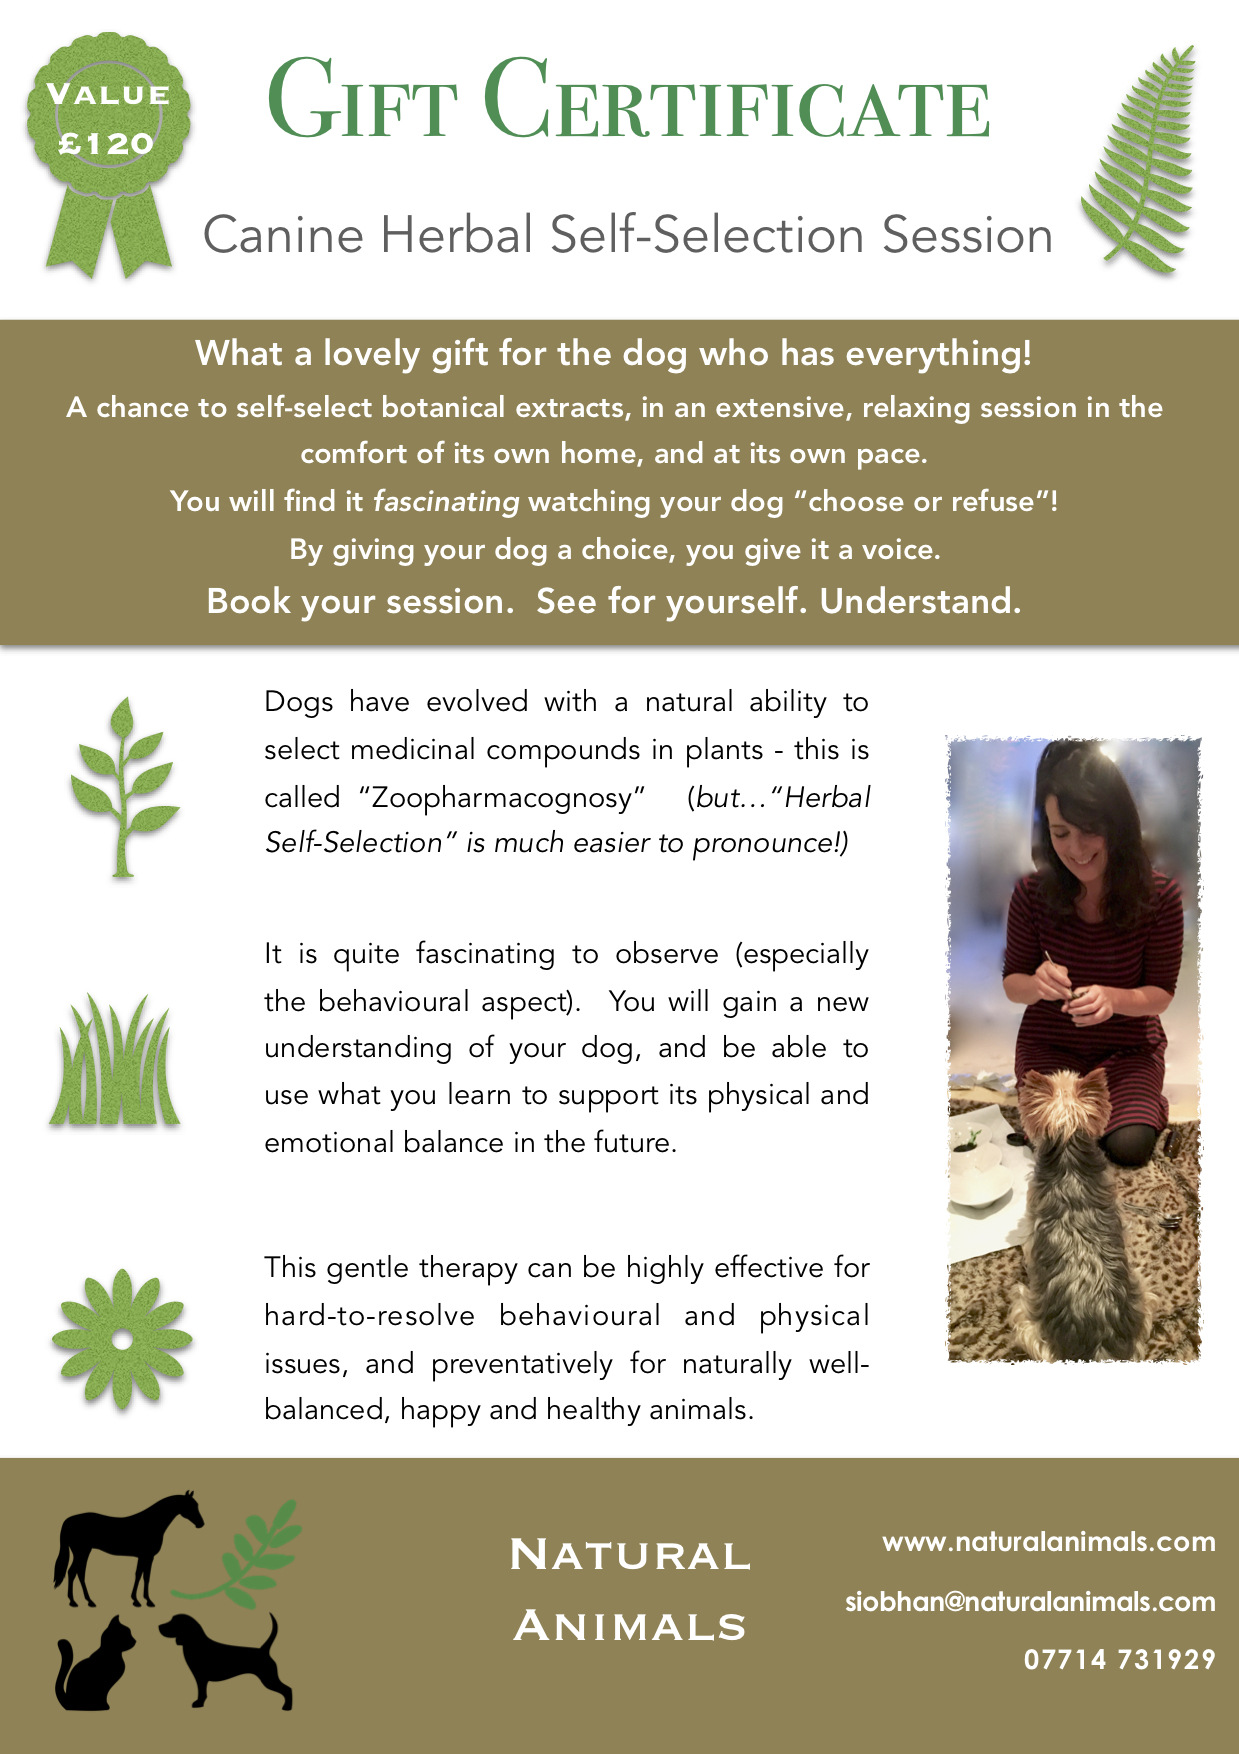 A5 NA Canine Gift Certificate P1.jpeg